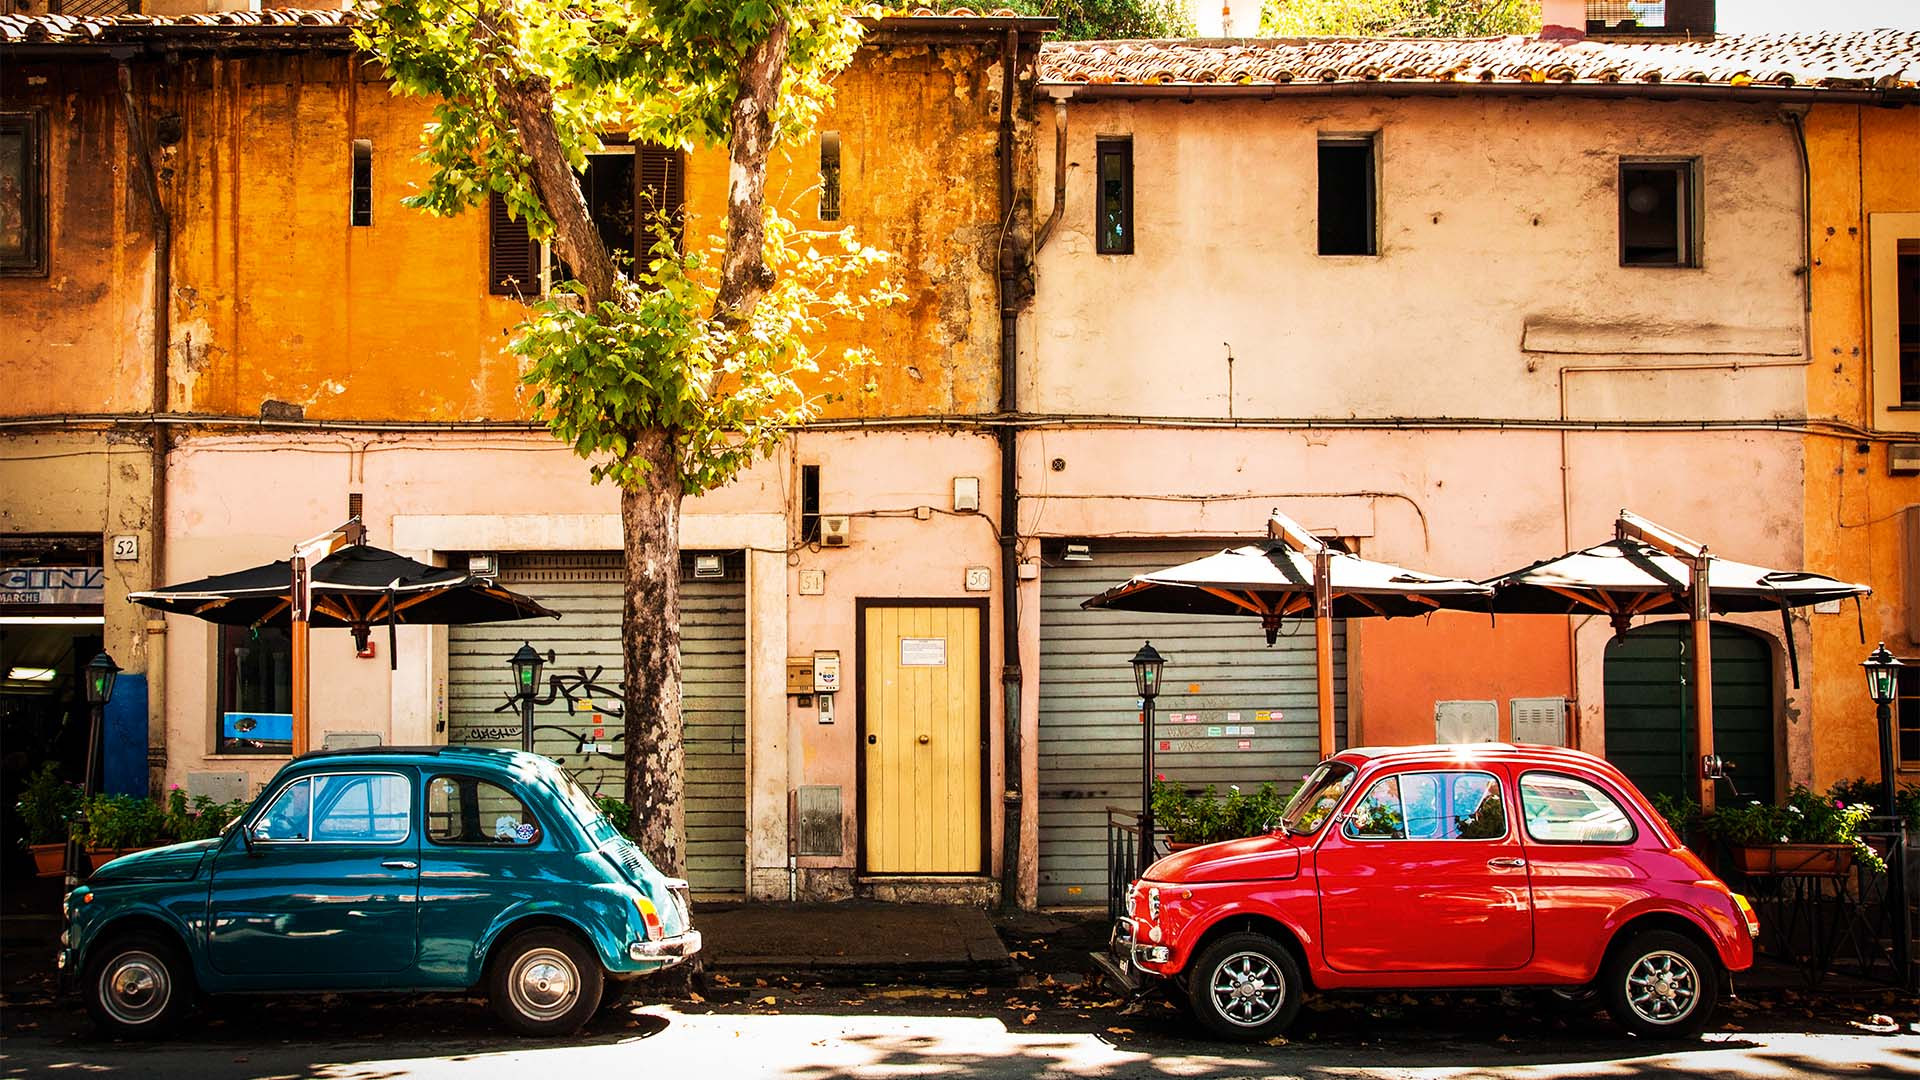 Fiat 500s in Rome, Italy